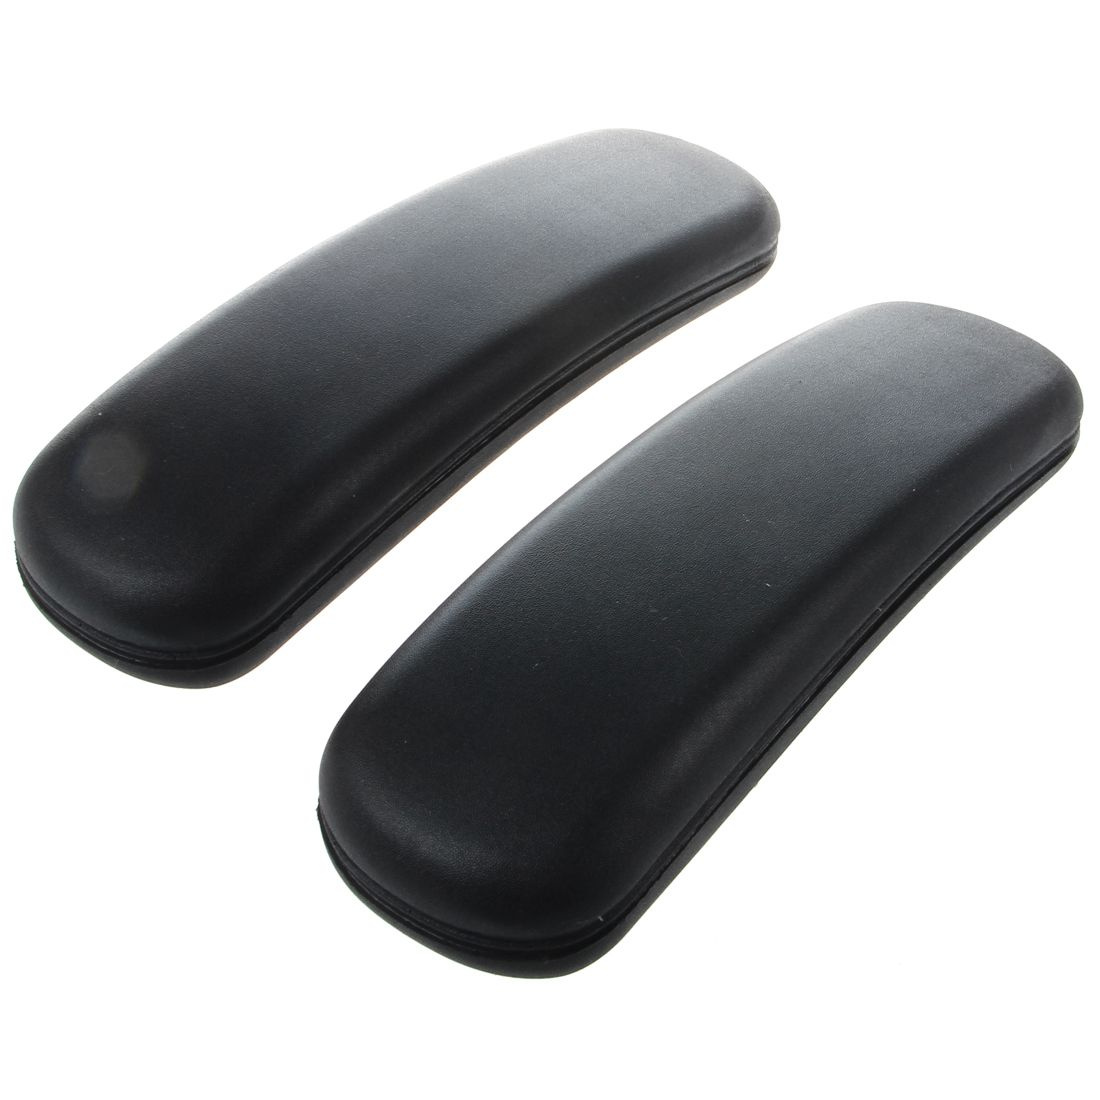 Office Chair Parts Arm Pad Armrest Replacement 9.75 x 3 (Black)Office Chair Parts Arm Pad Armrest Replacement 9.75 x 3 (Black)